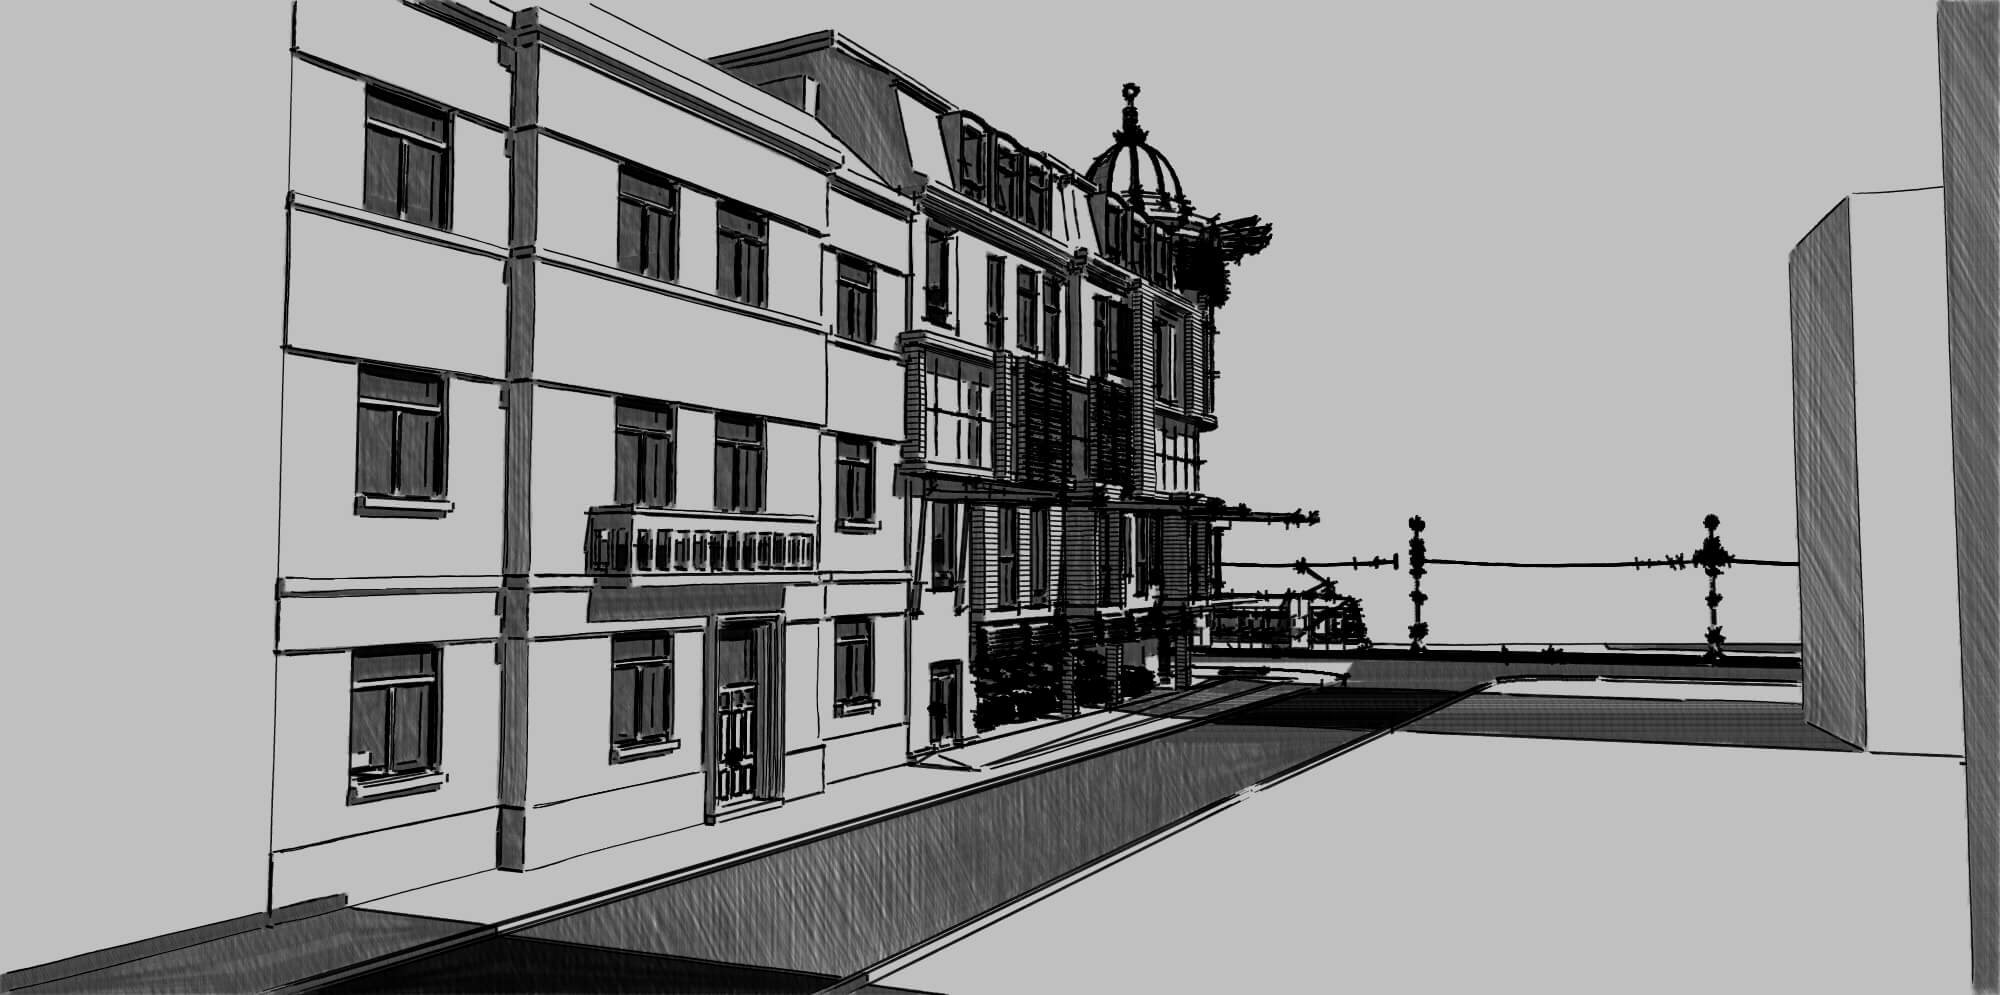 Каскад-Будинвест: проекты компании (изображение 27)